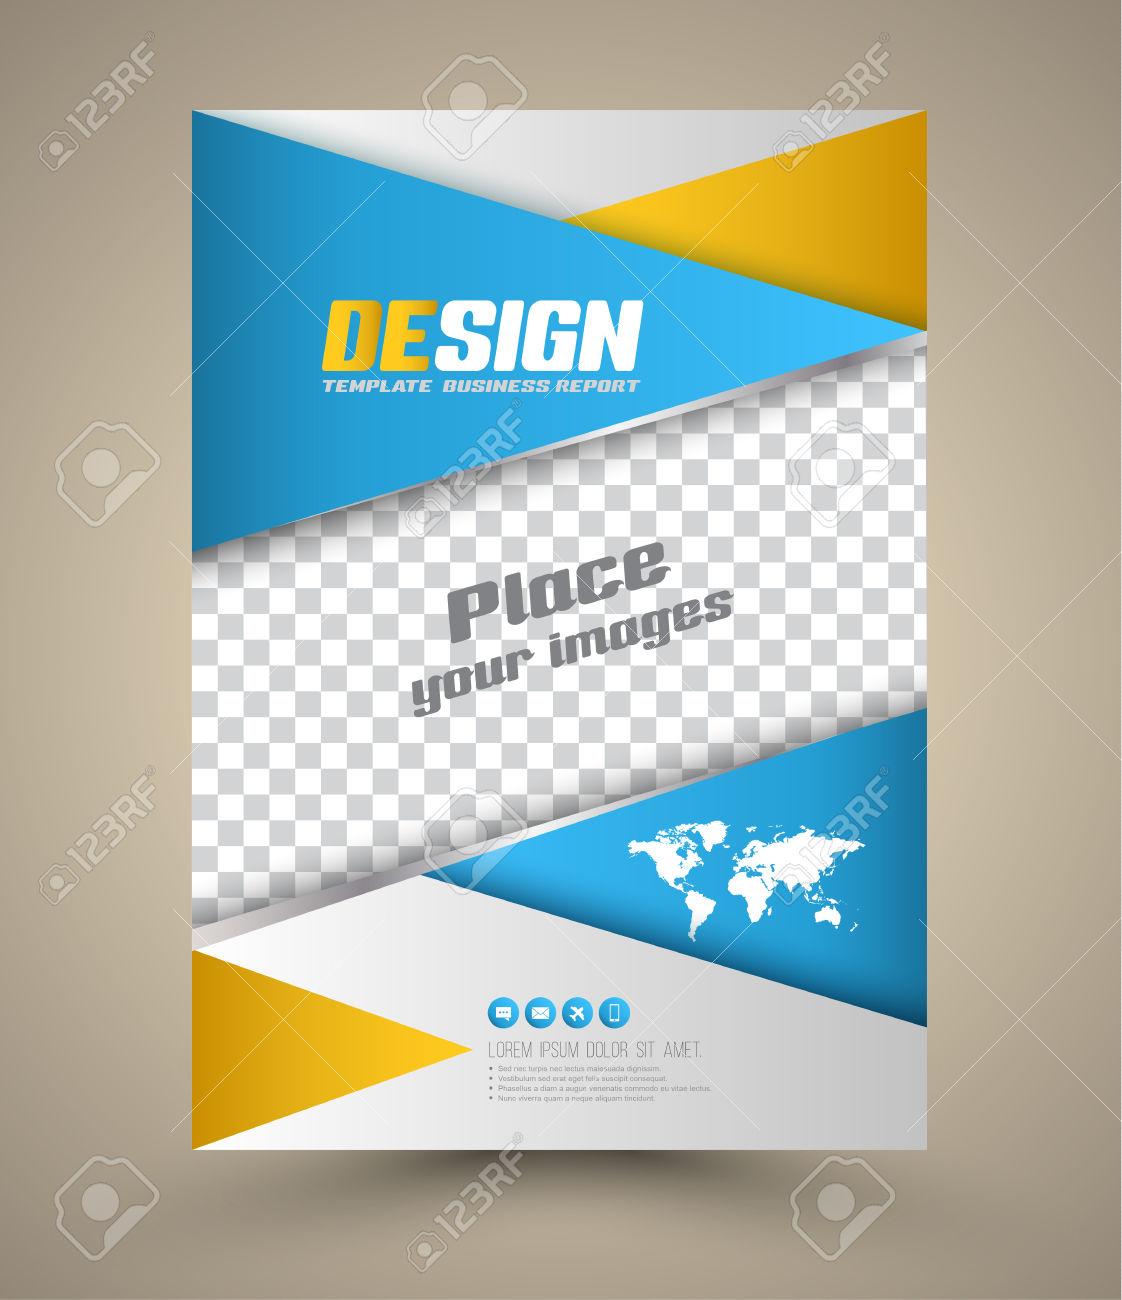 Design A Book Cover Template Ks : Free design book clipground